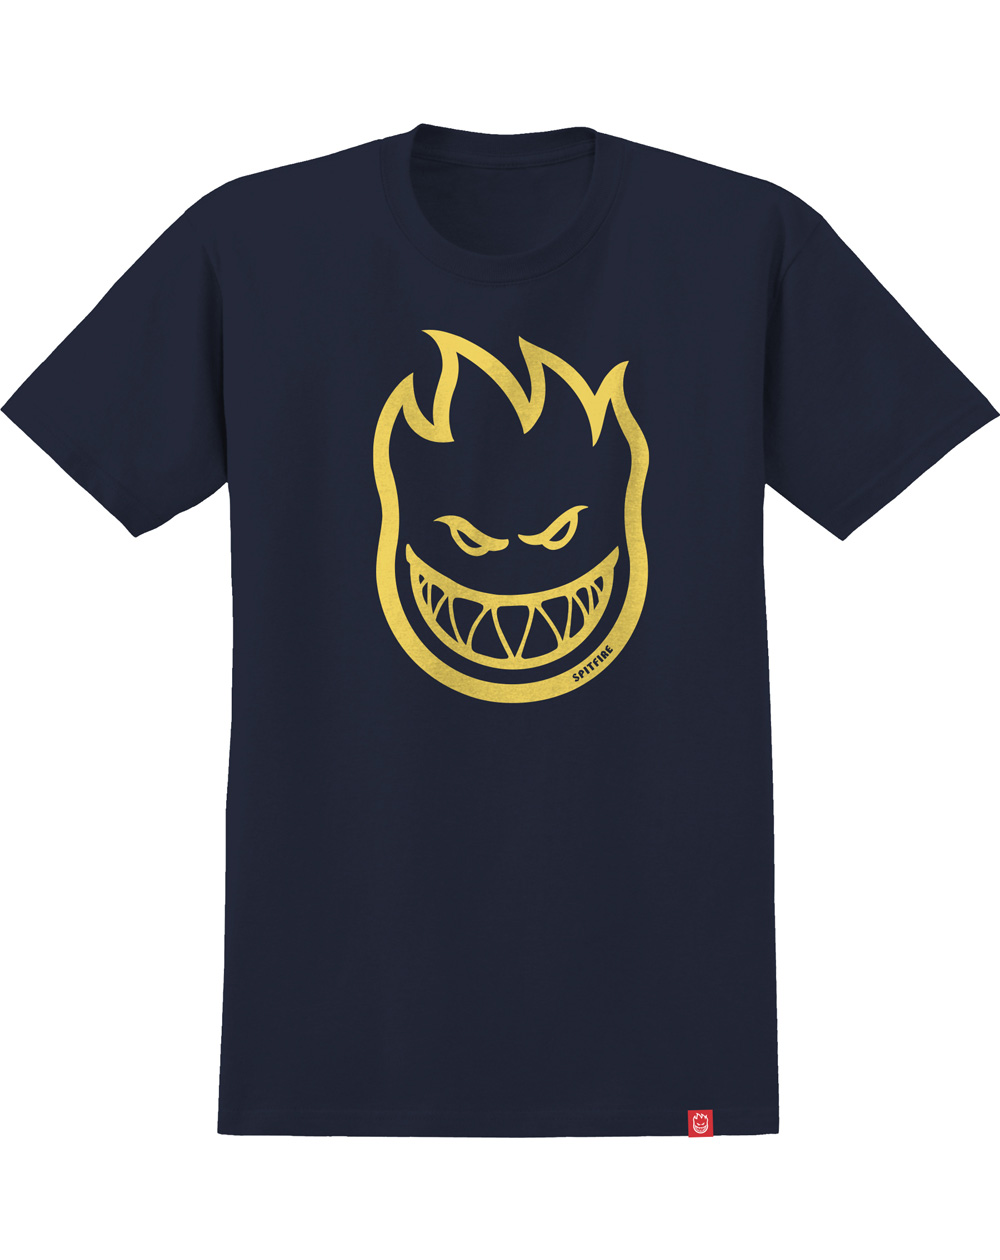 Spitfire Men's T-Shirt Bighead Navy